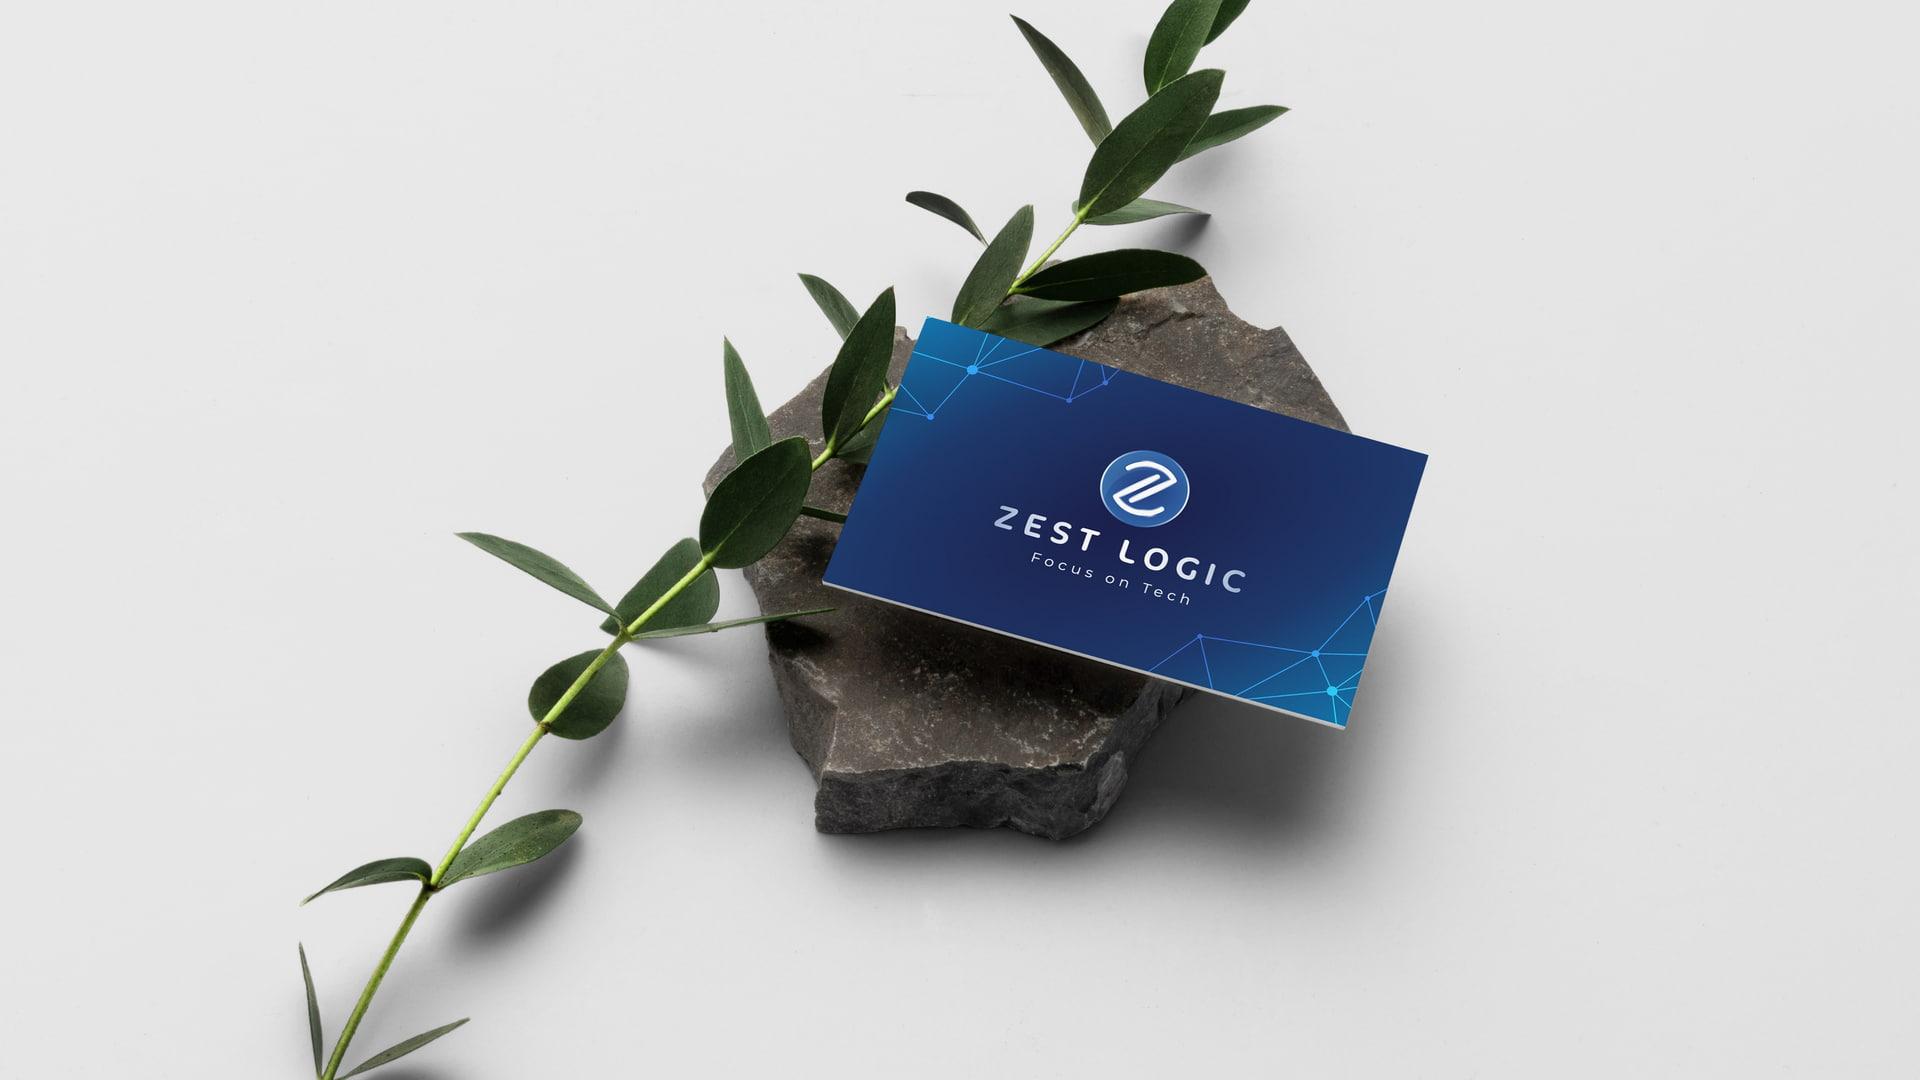 Zest Logic - створення логотипу